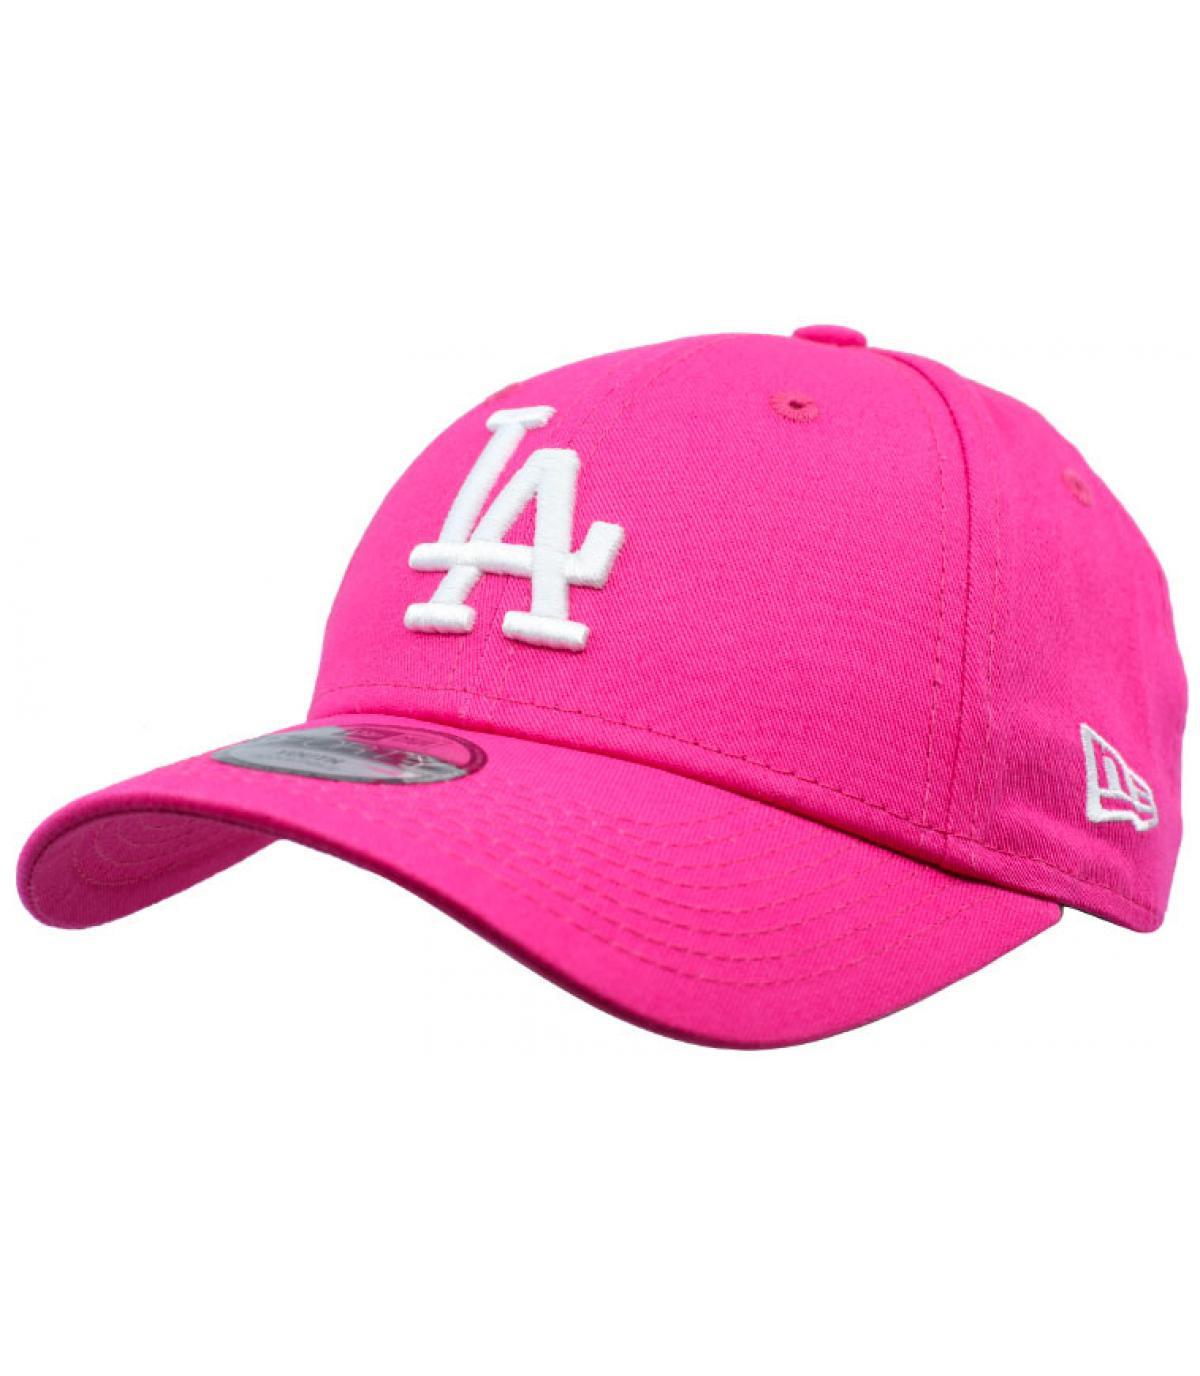 cap LA bambina rosa - Kids League Ess LA 9Forty beetroot purple da ... 5e095e8c0d2e